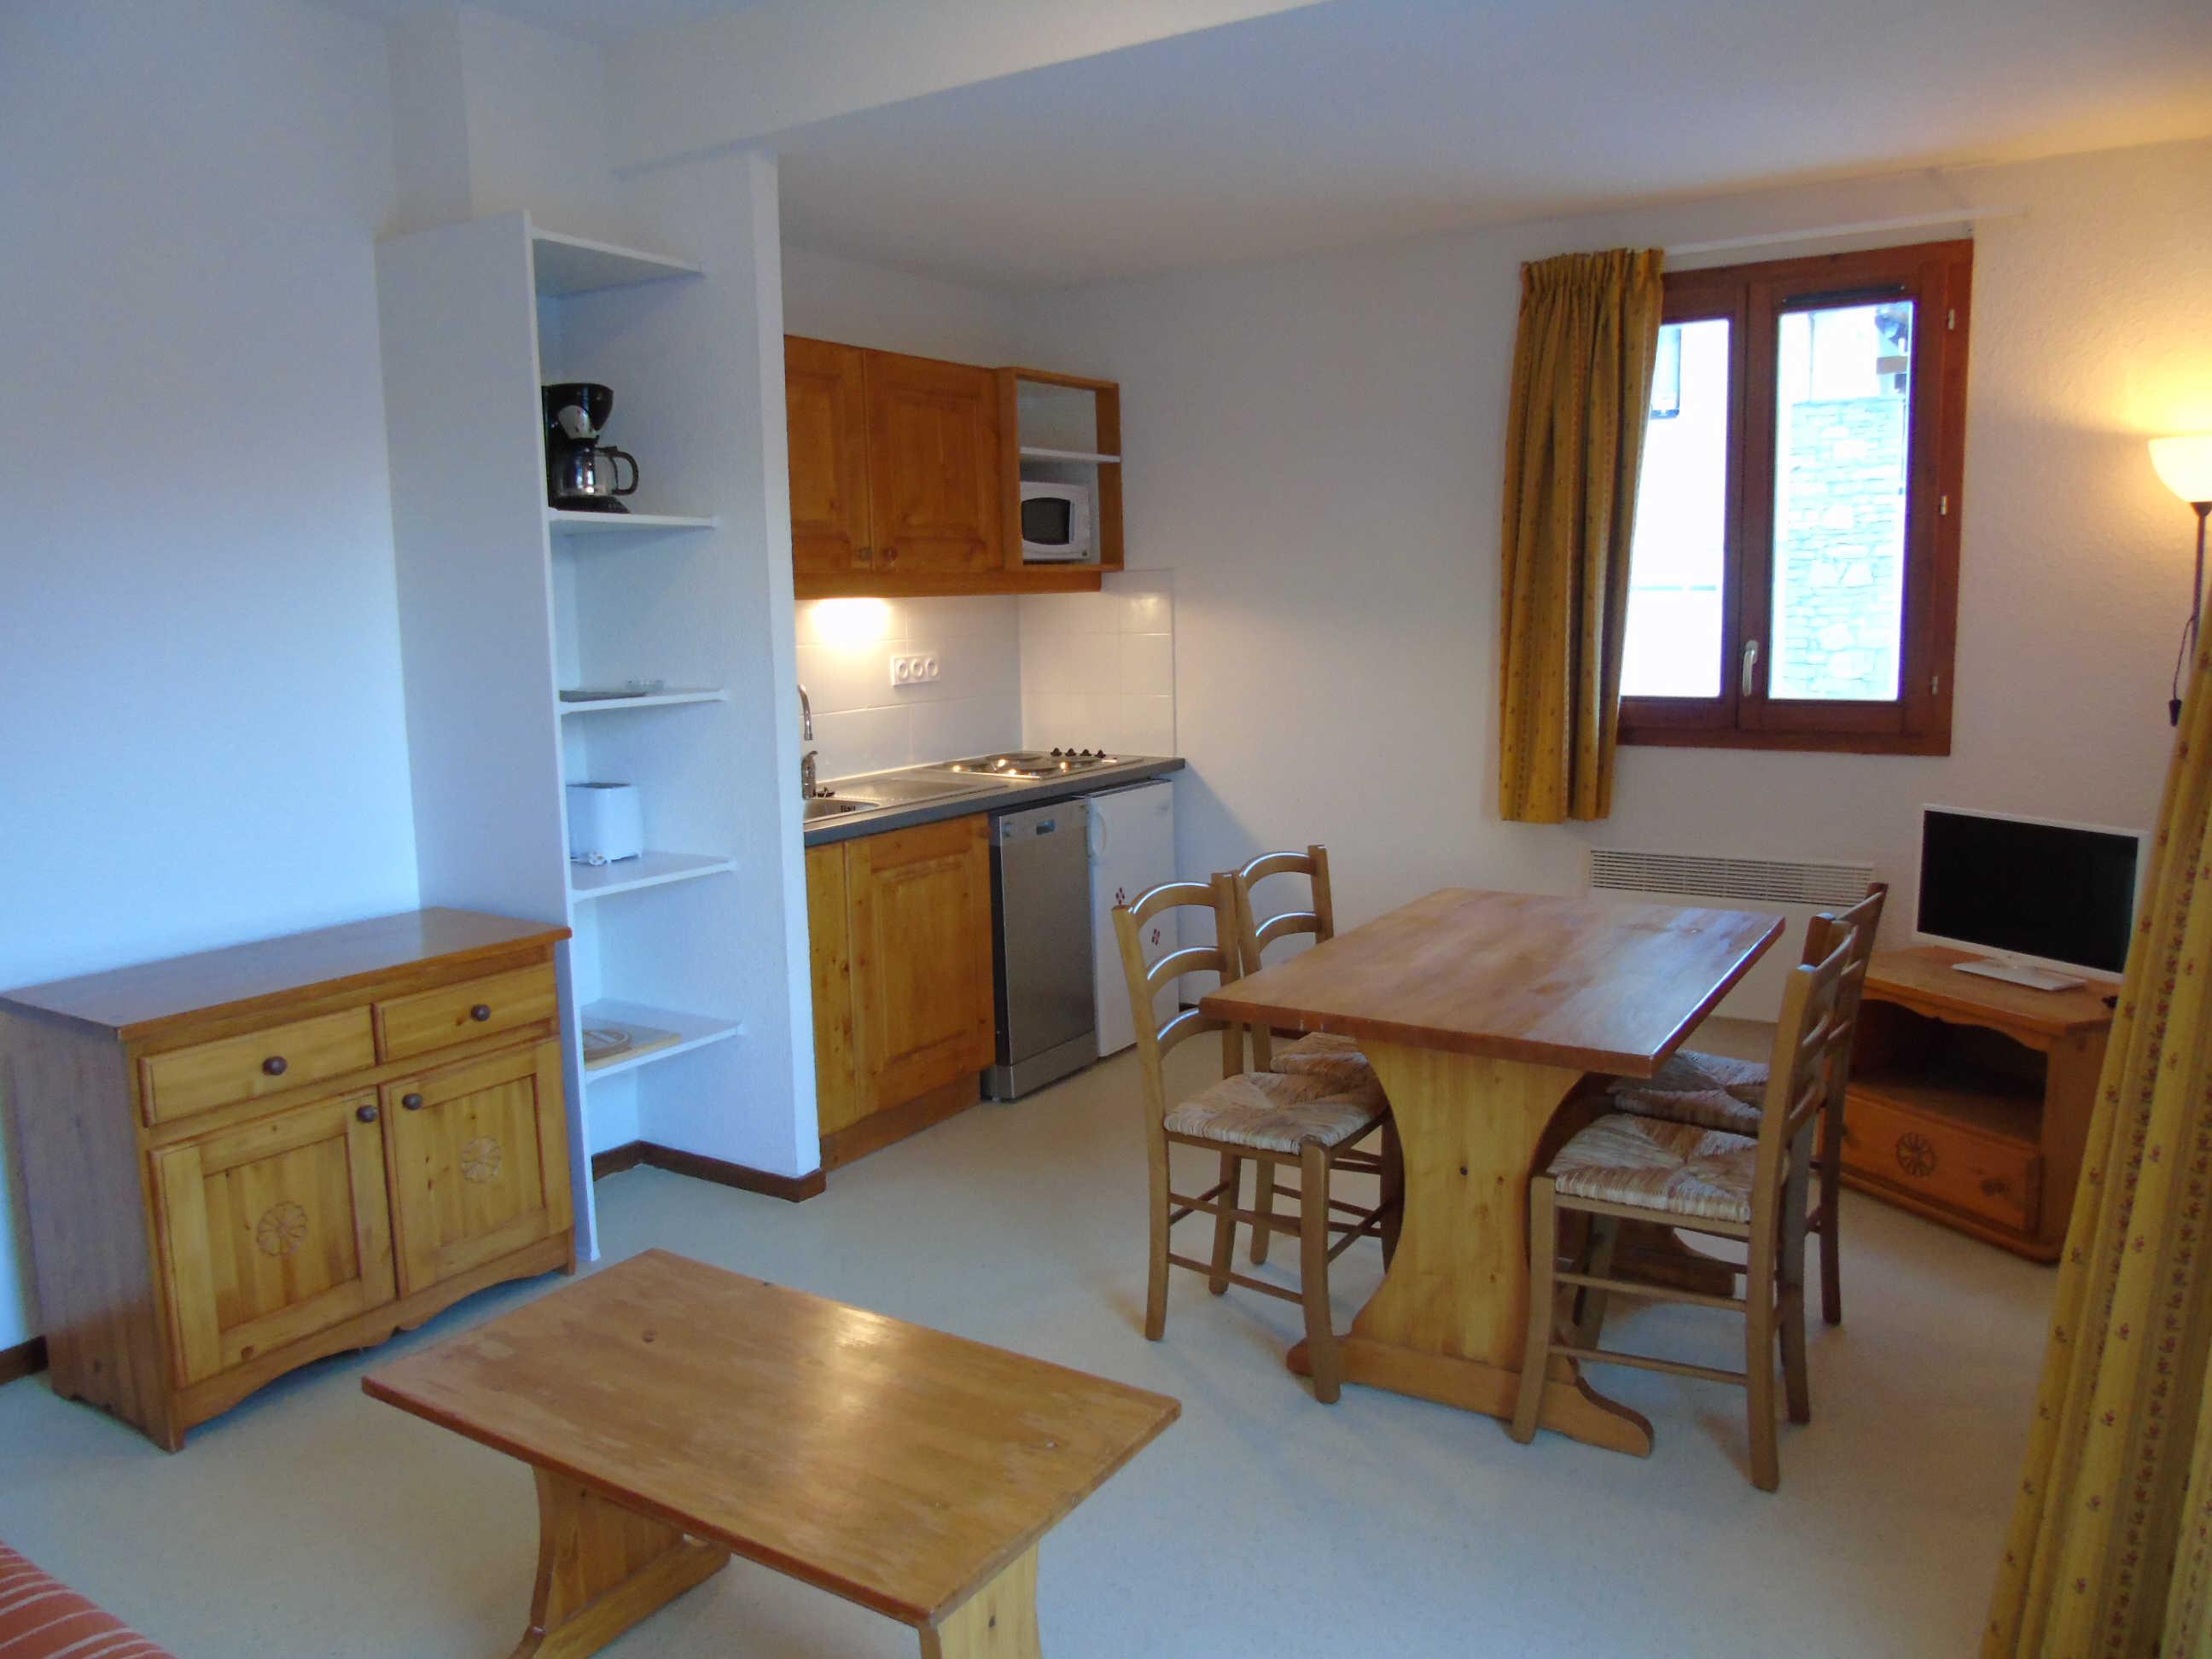 ski tout compris derni re minute offres disponibles. Black Bedroom Furniture Sets. Home Design Ideas